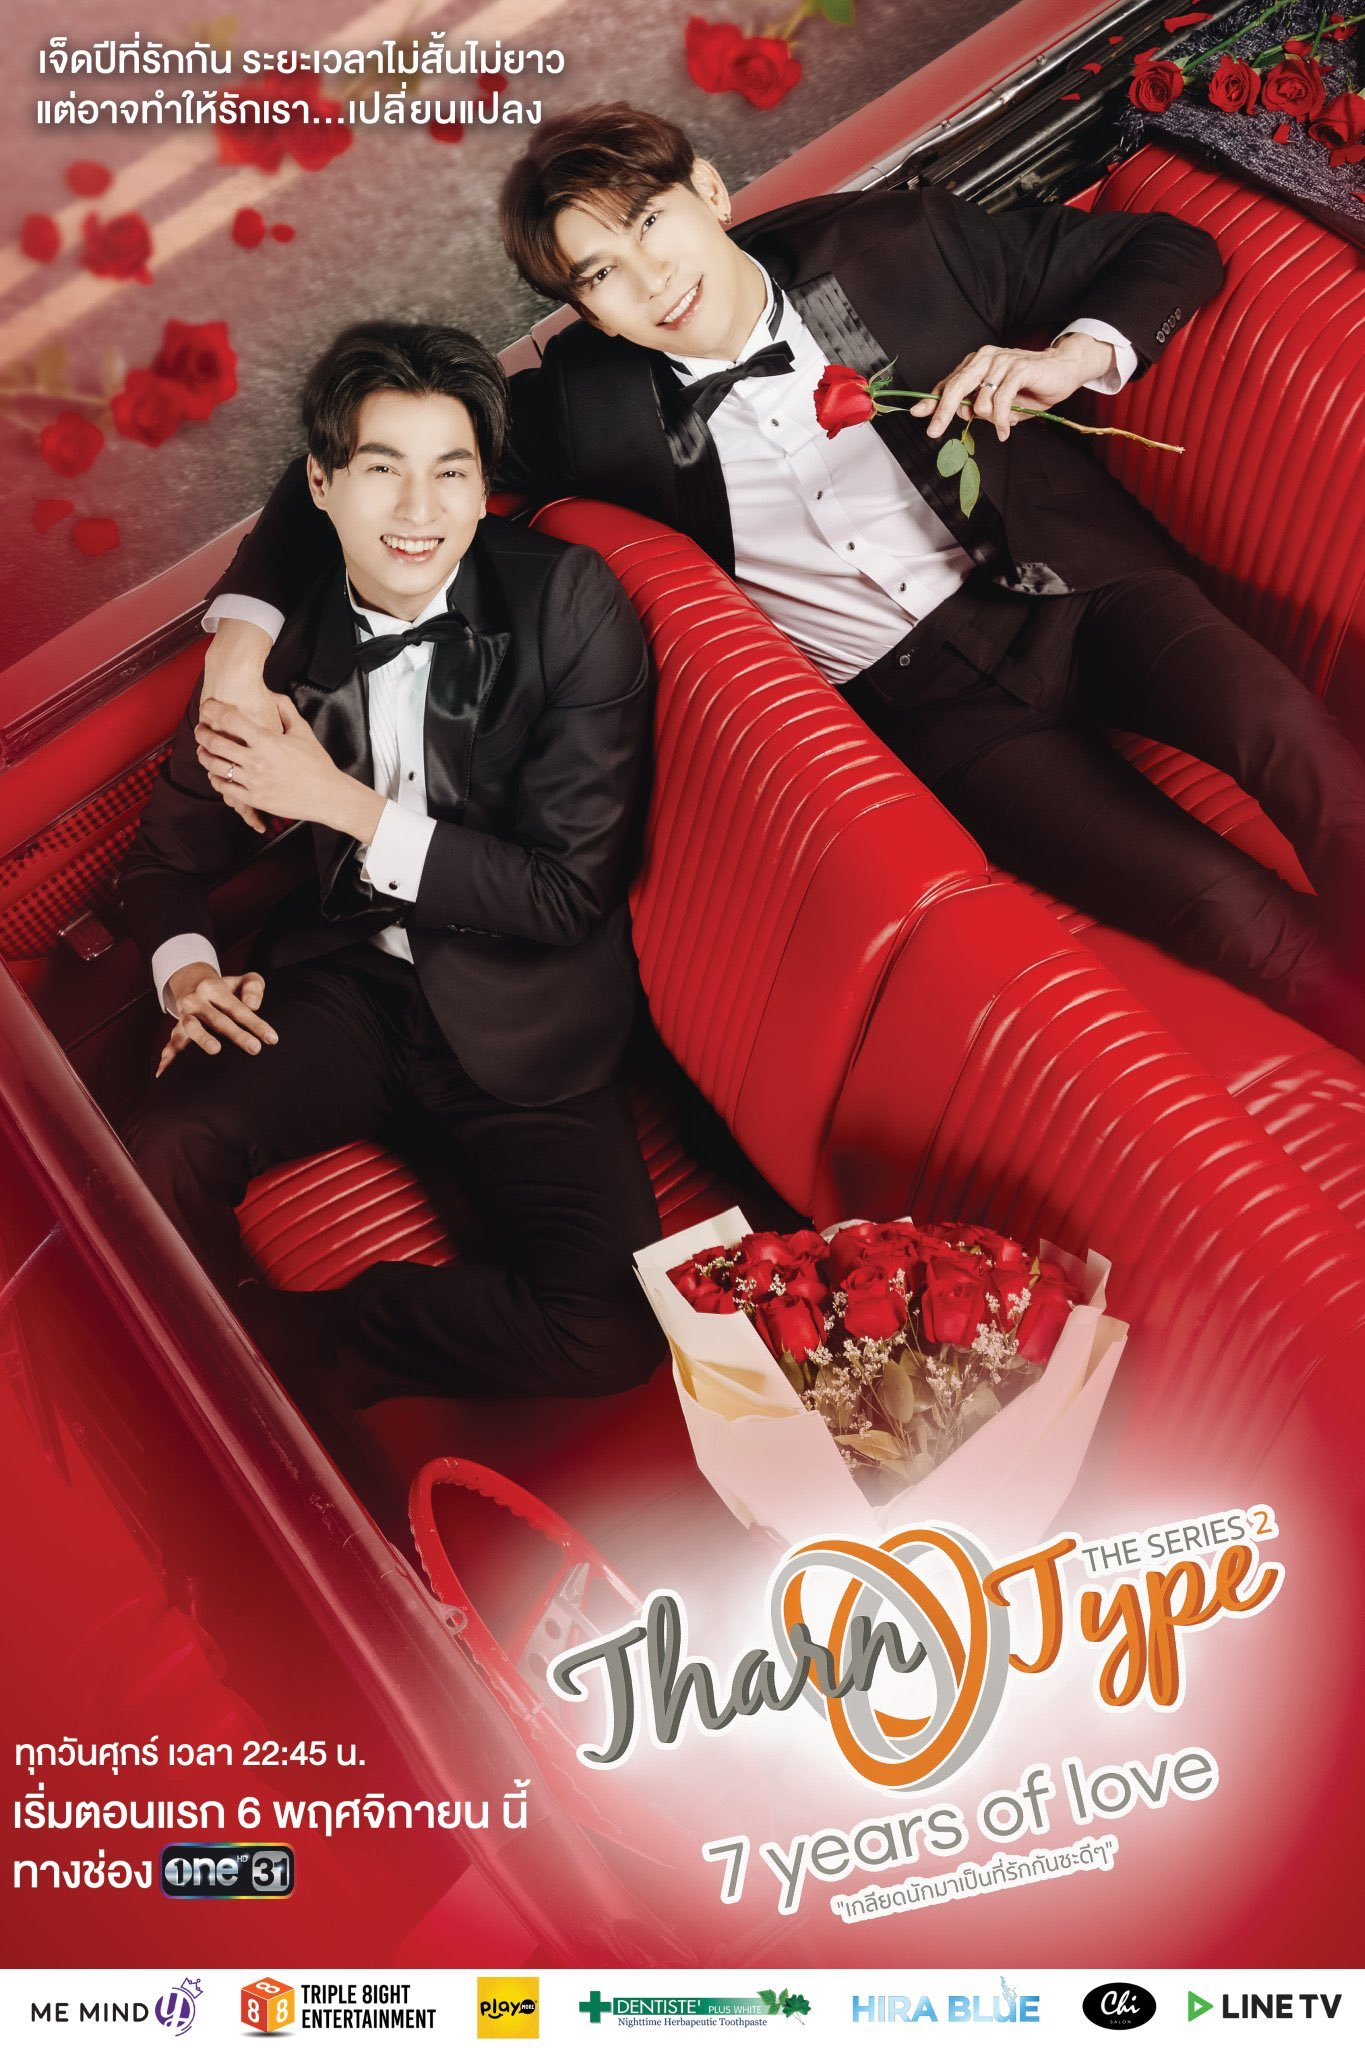 Tharntype 2 7 Years Of Love Drama Wiki Fandom